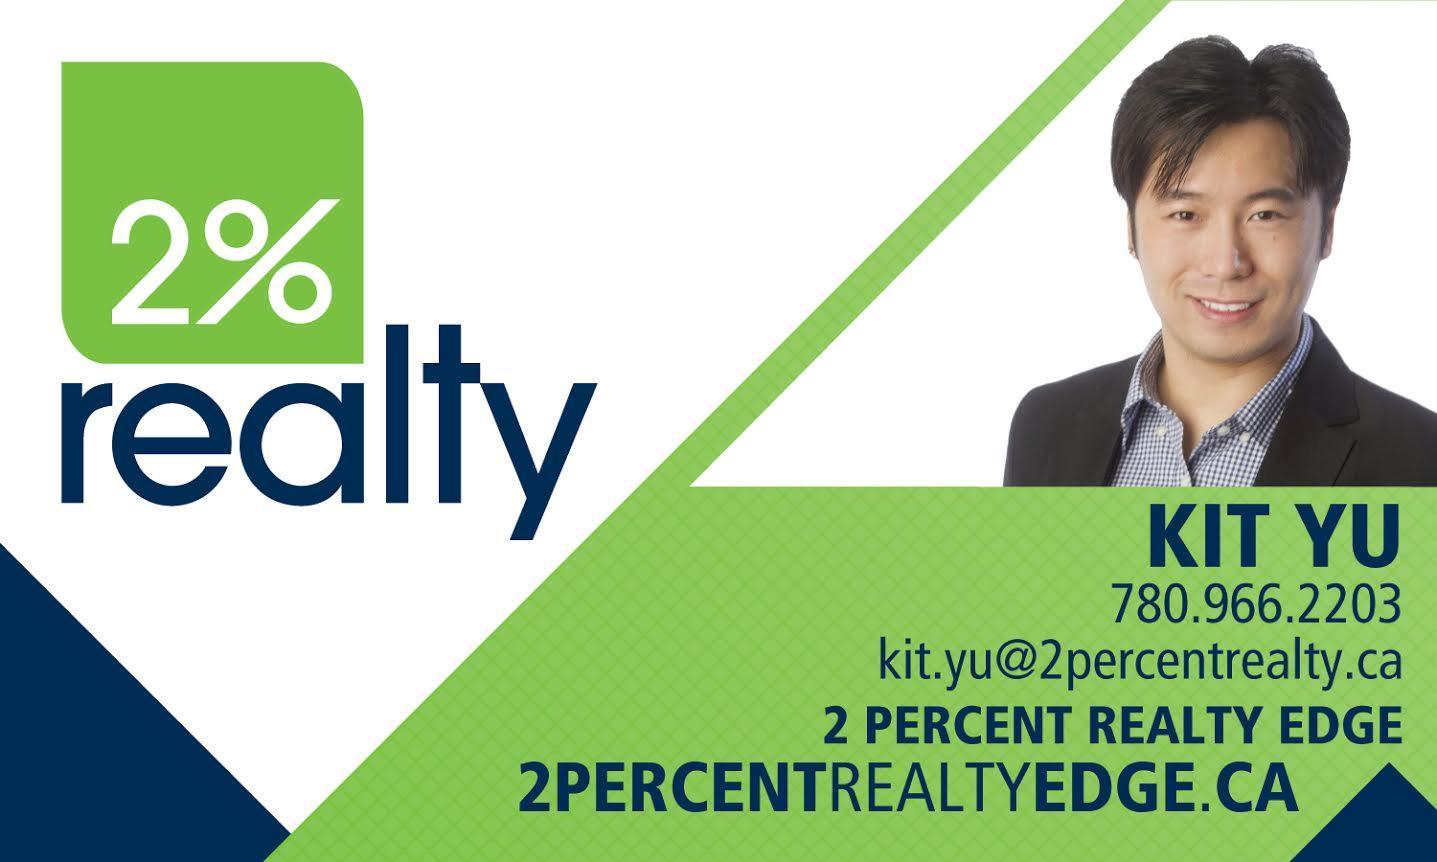 Kit Yu - Realtor - 2% Realty Edge